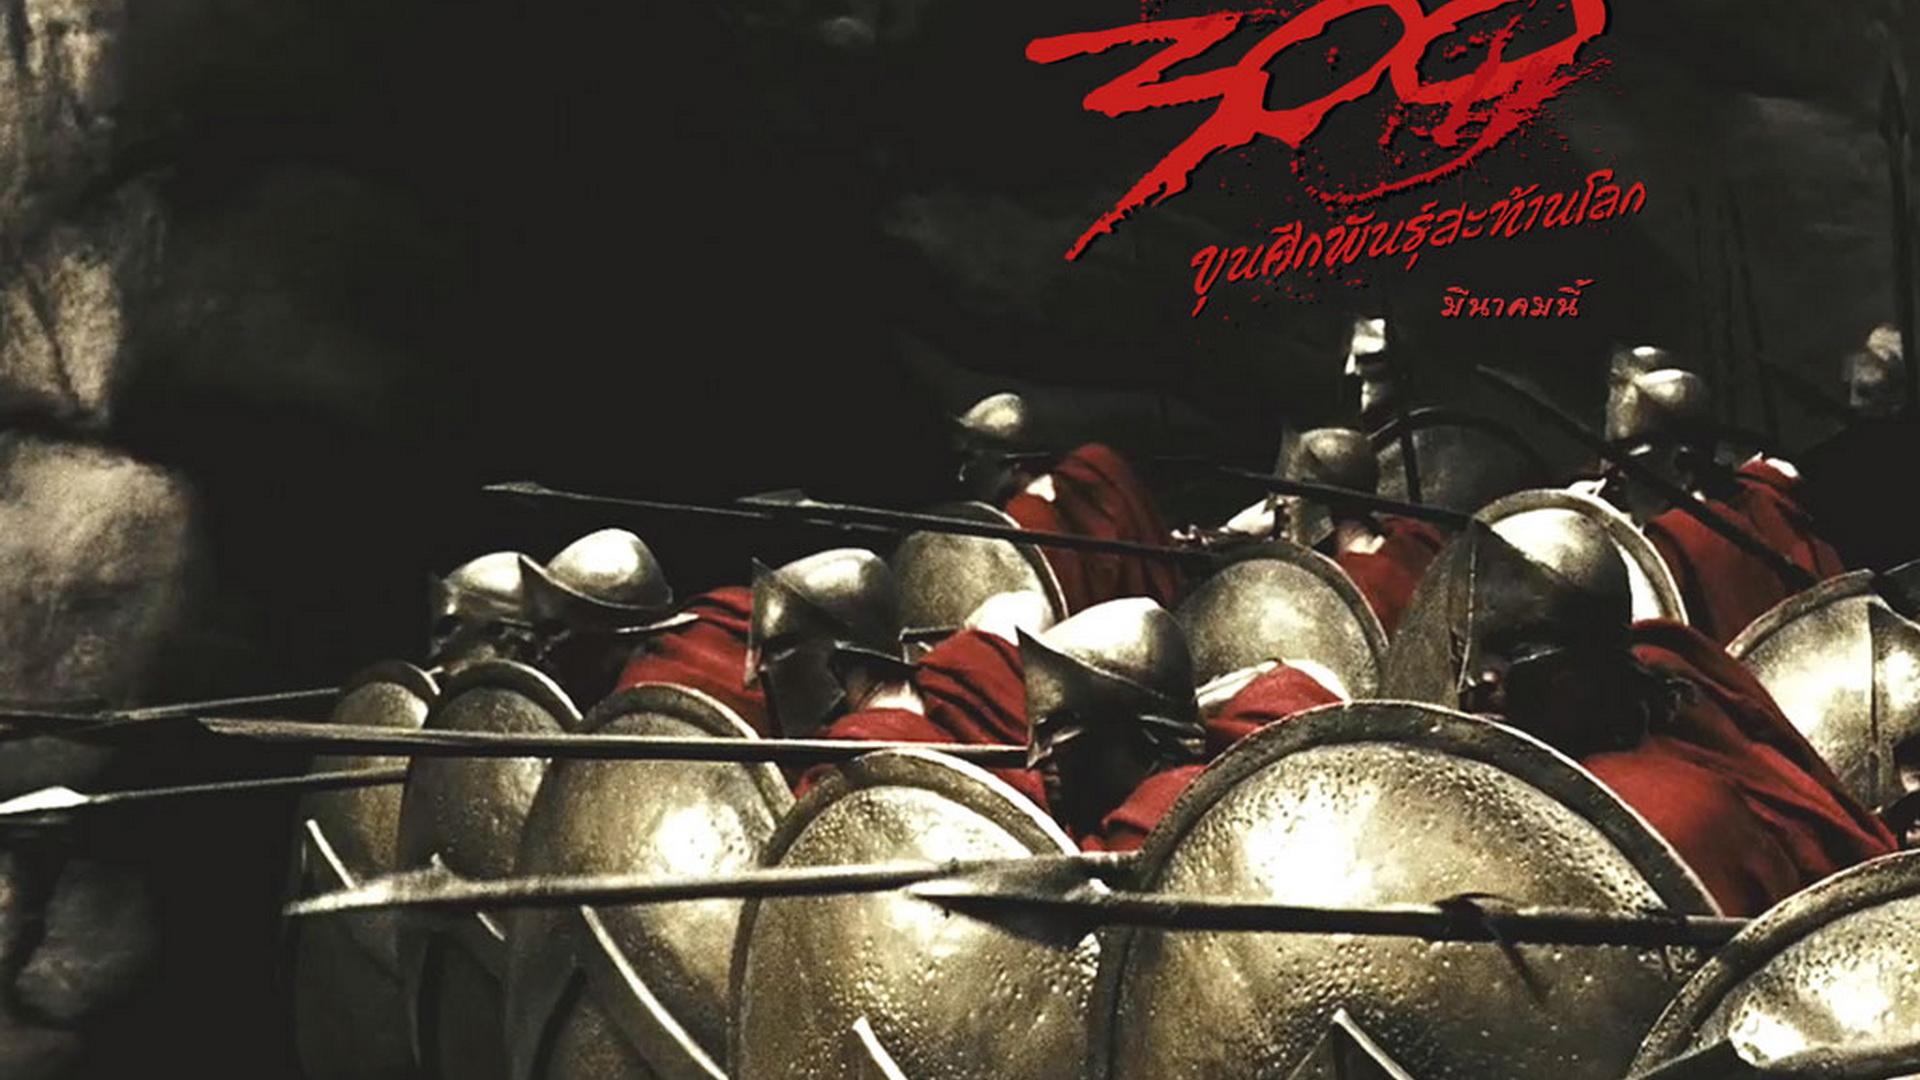 michigan state spartans 300 wallpaper